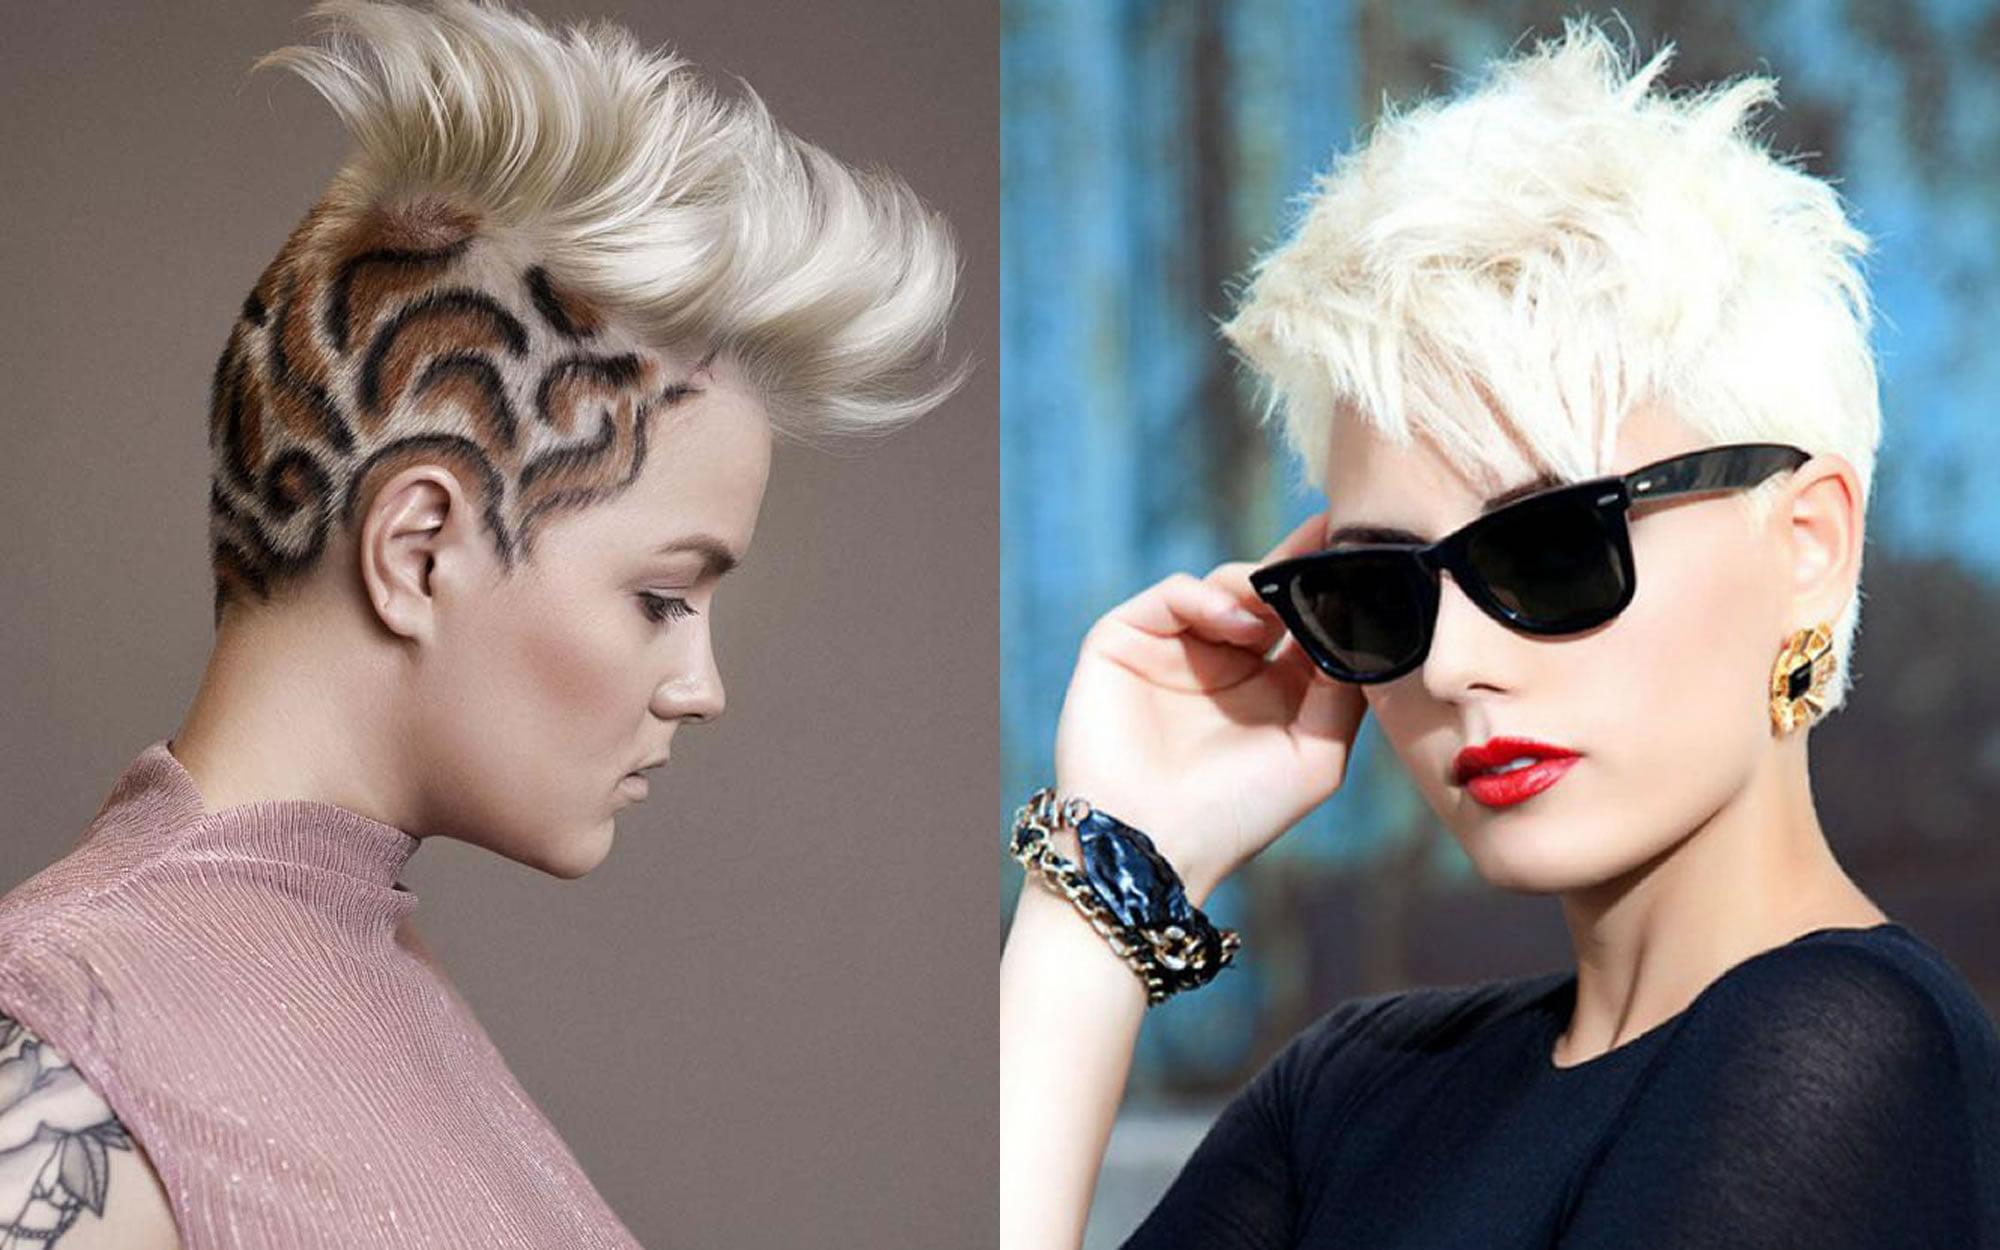 22 Cool Undercut Short Haircut For Female Best Hair Colors For